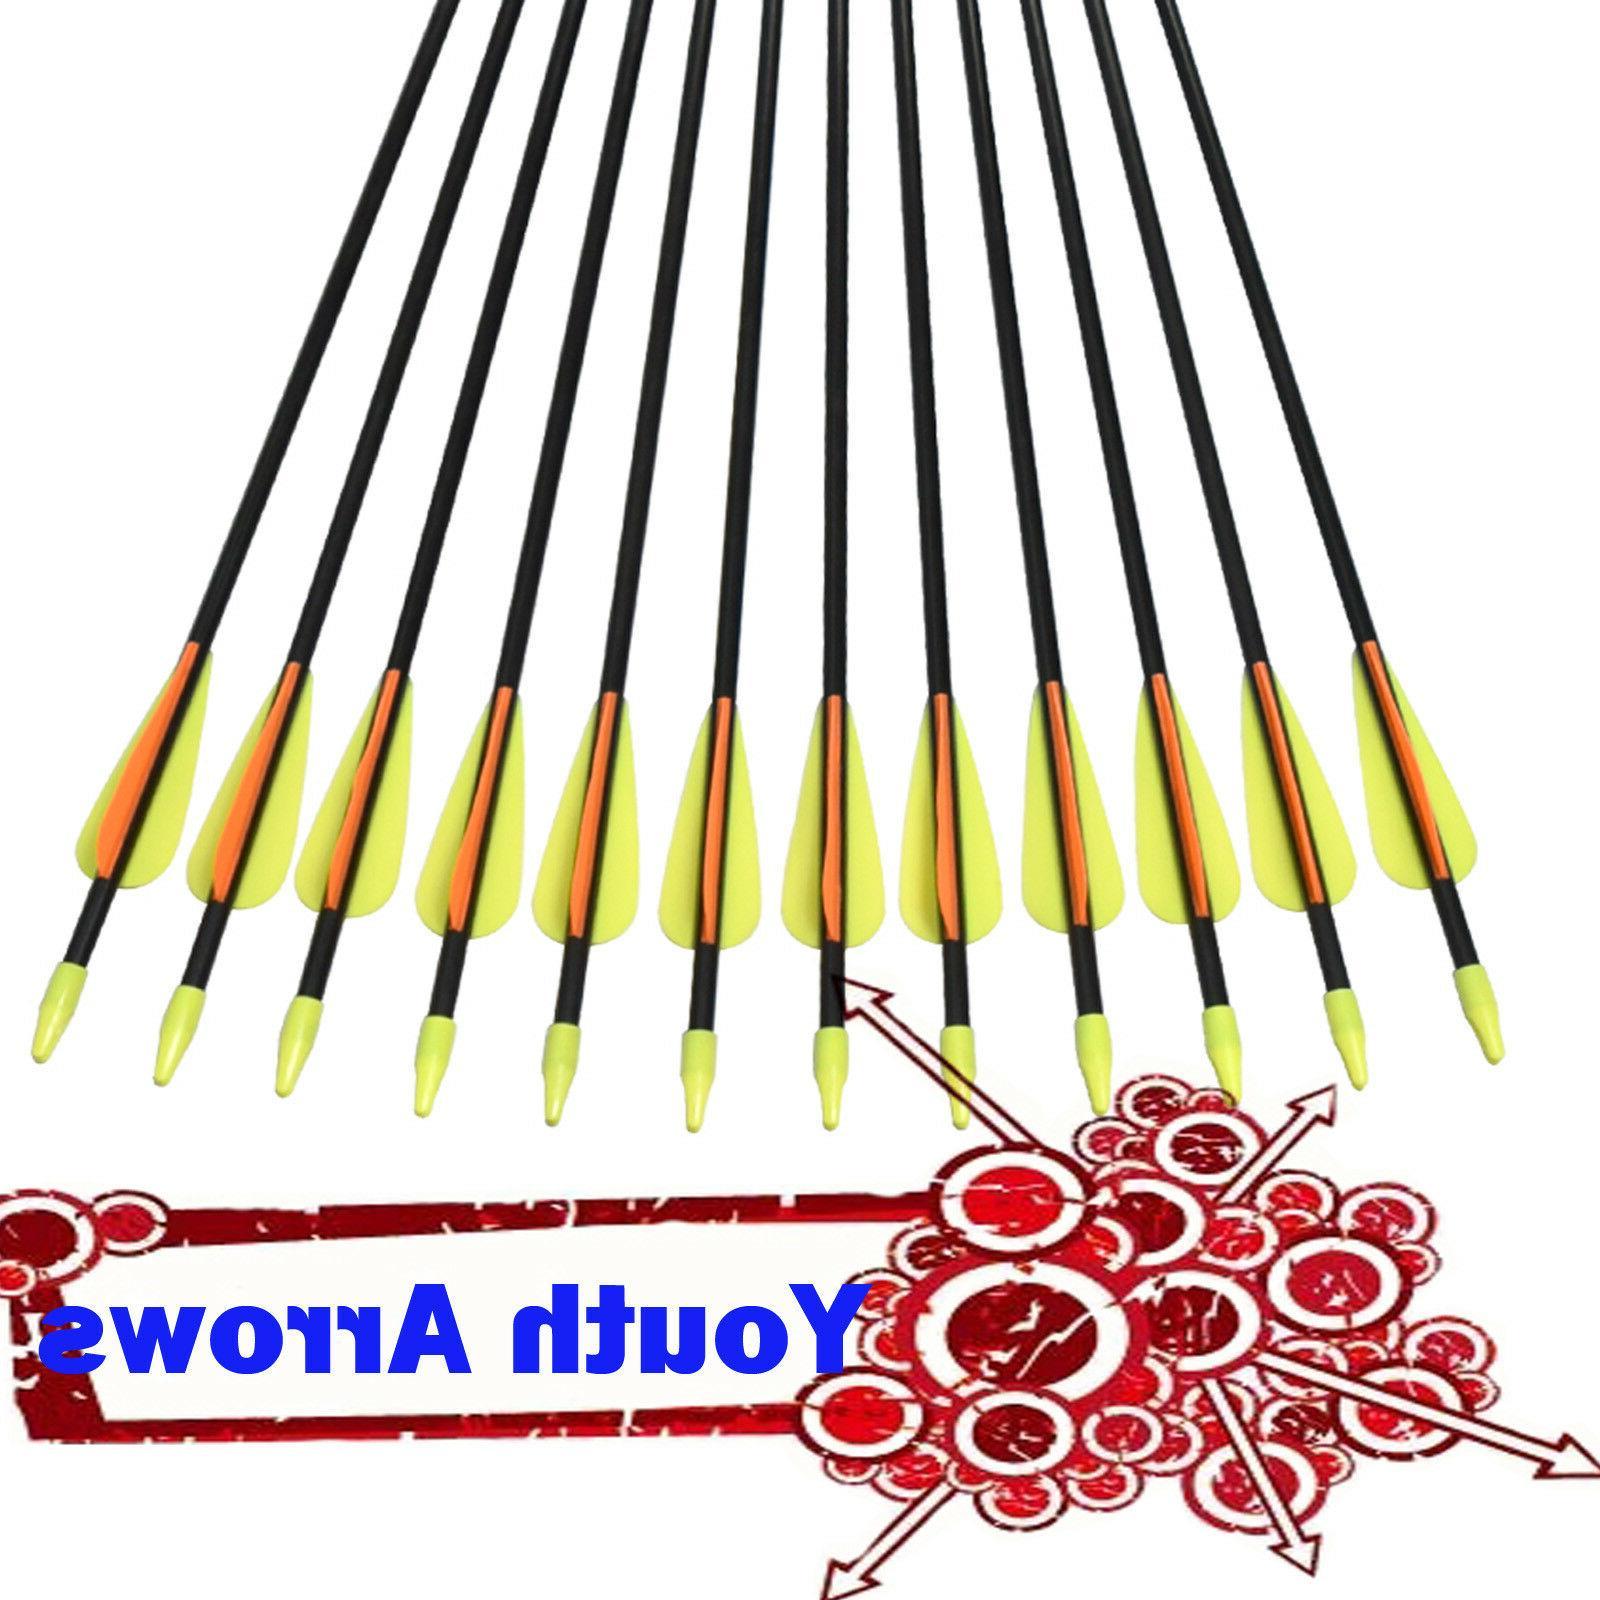 26 fiberglass arrows compound bow youth archery